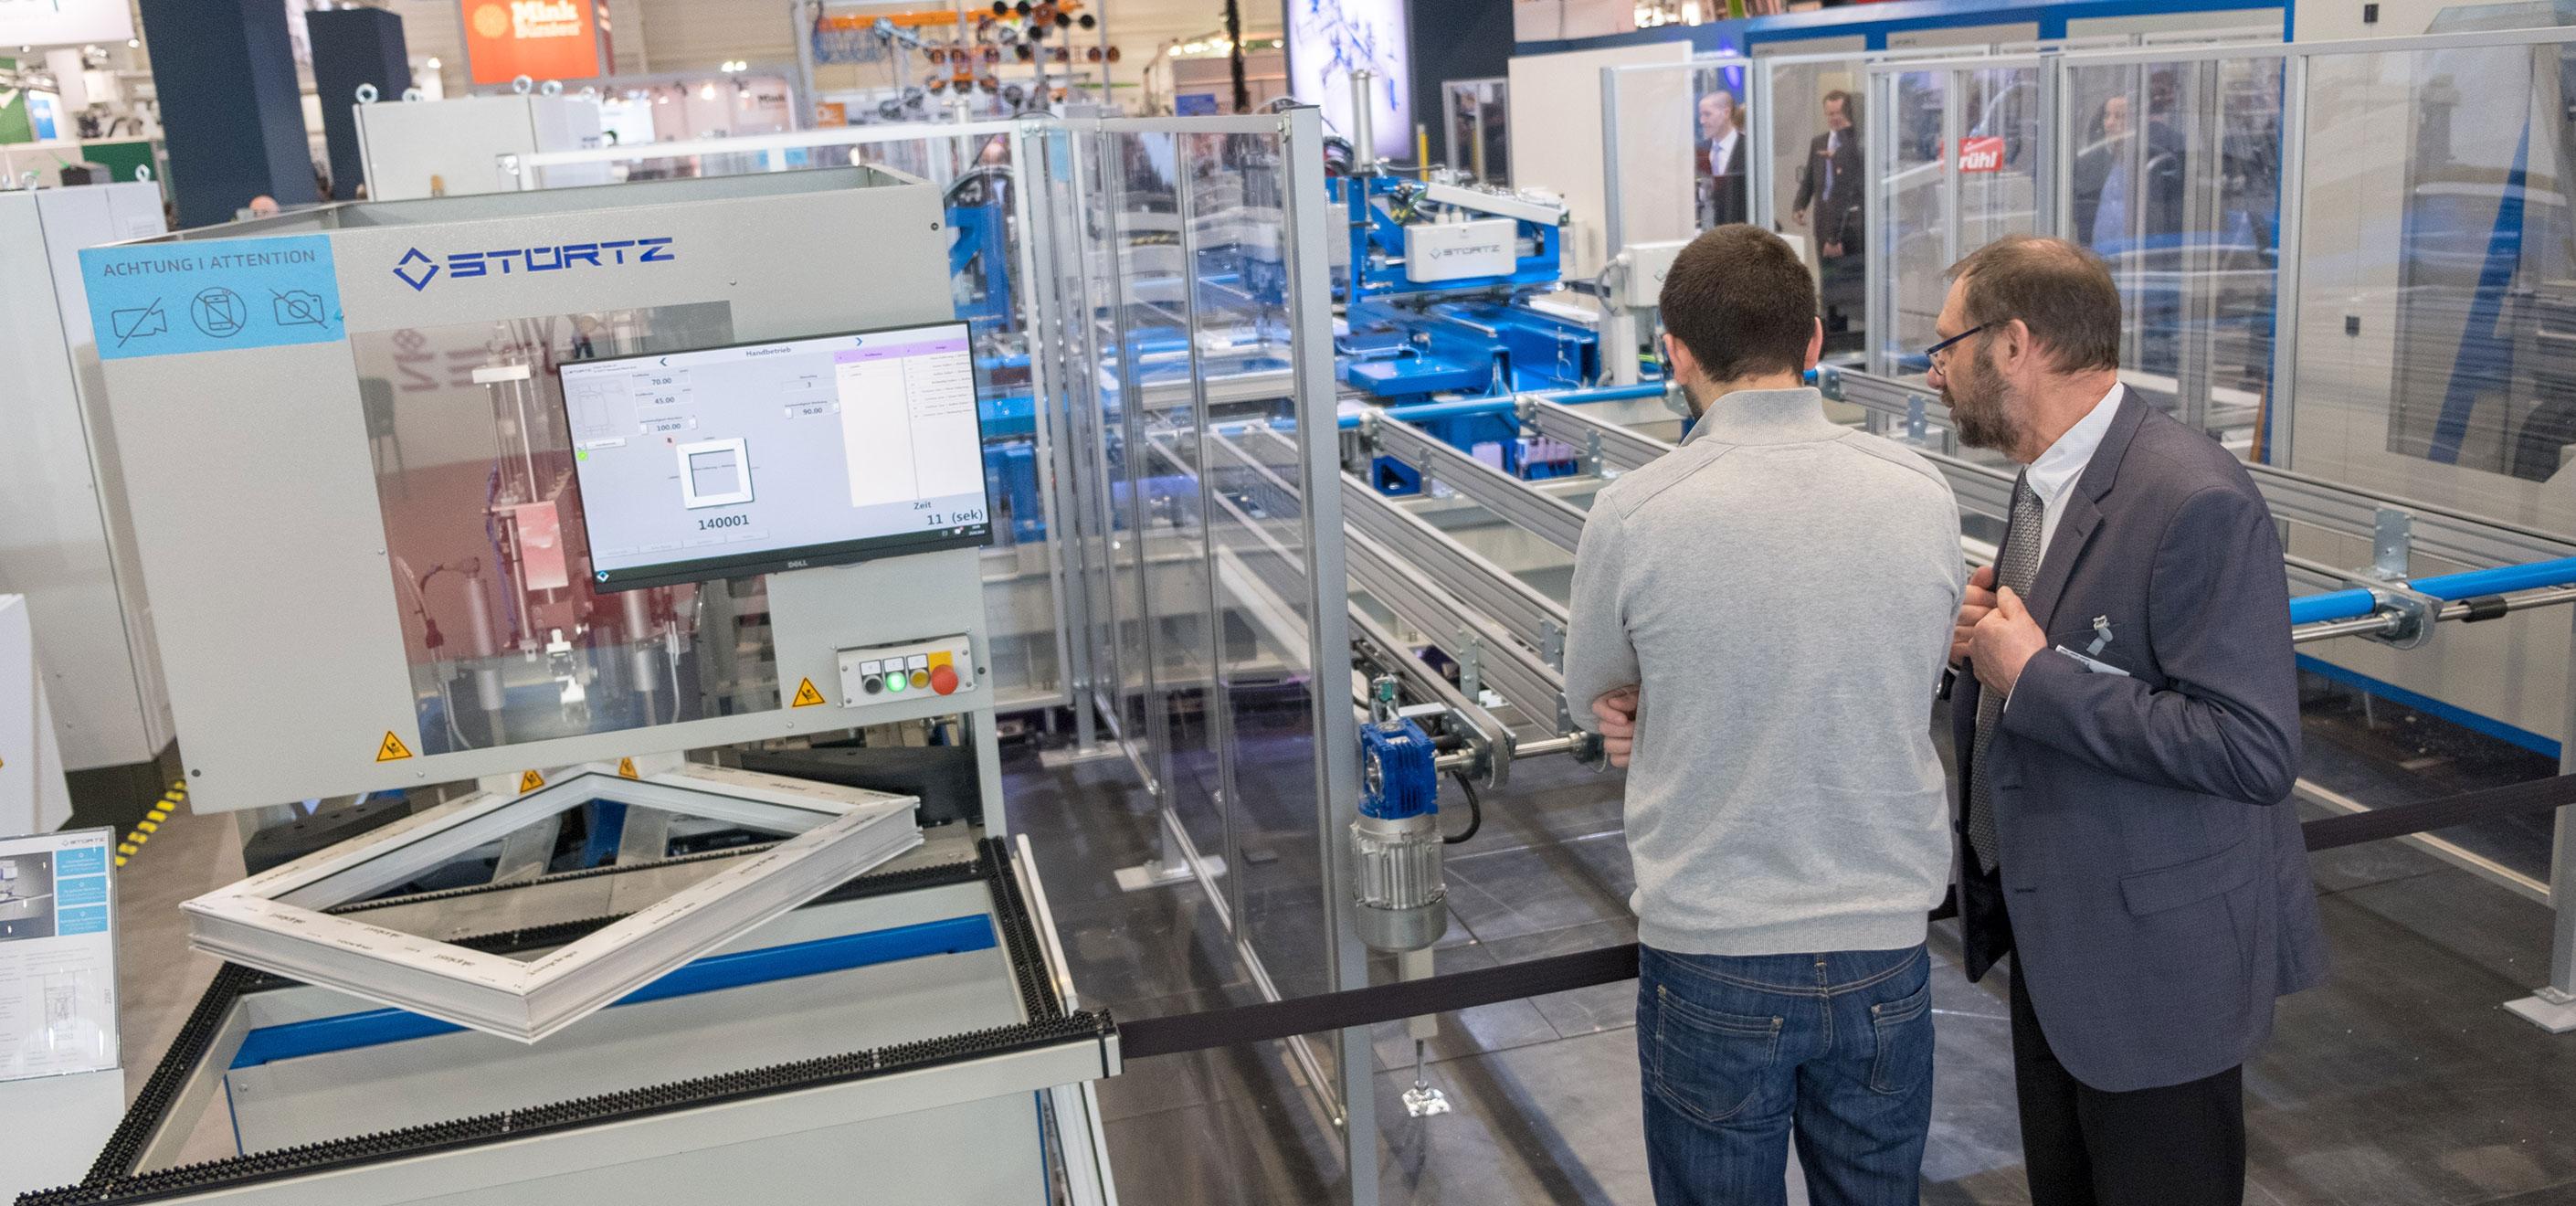 Rückblick FENSTERBAU FRONTALE 2019 - Produktionsmaschine